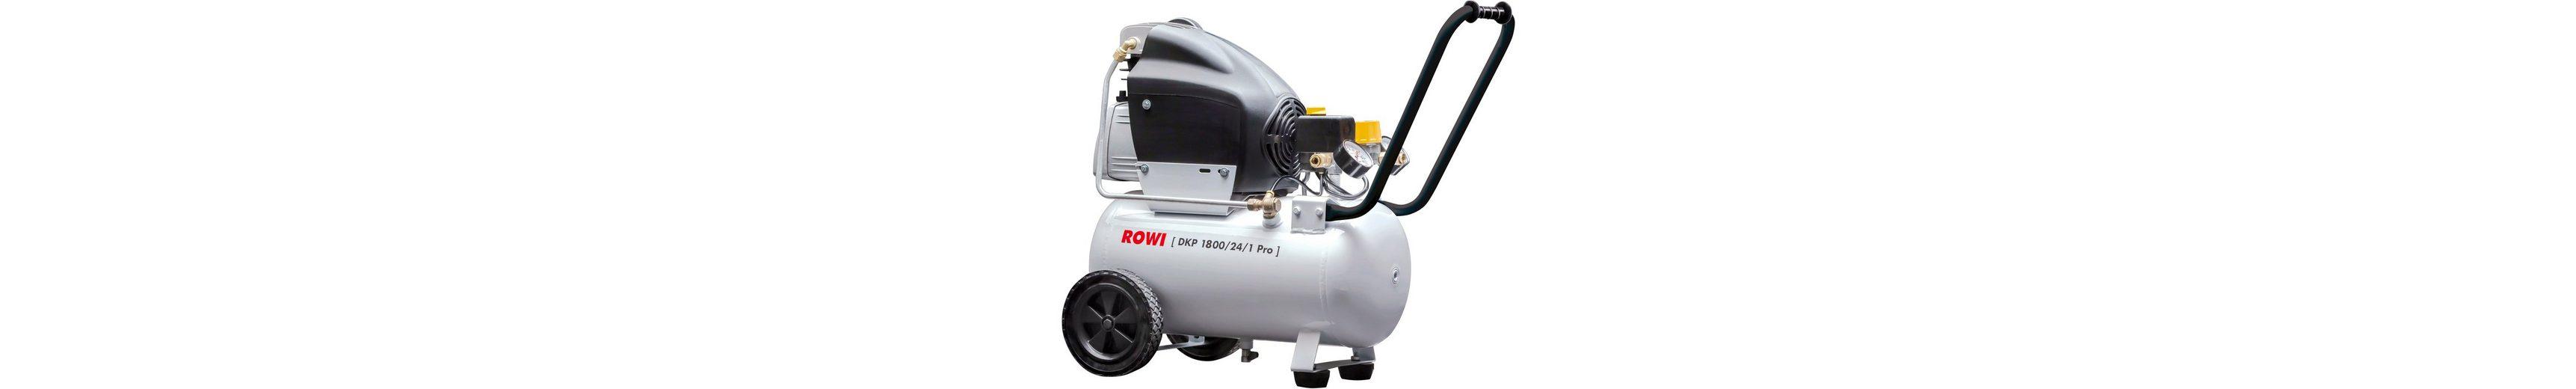 Kompressor »DKP 1800/24/1 Pro«